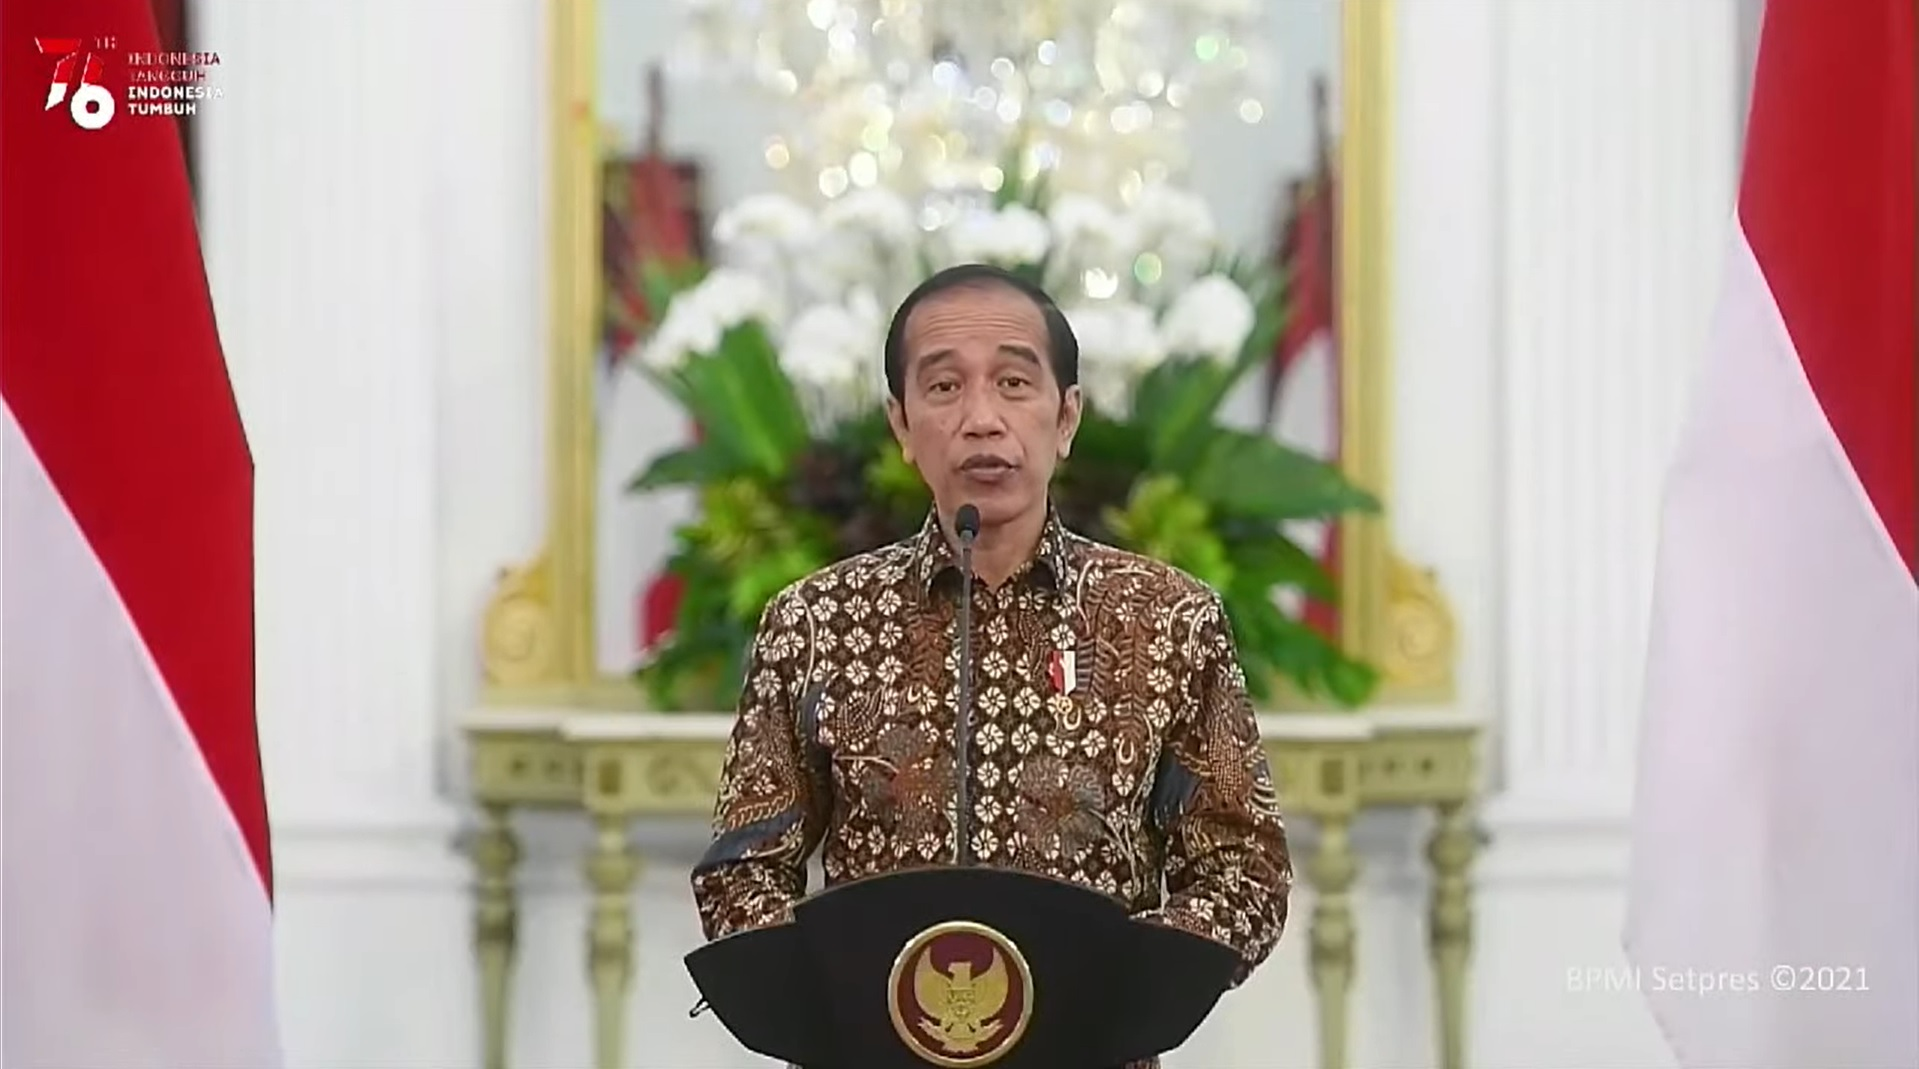 Jokowi: Januari Hingga Mei 2021 Ekonomi Sempat Membaik